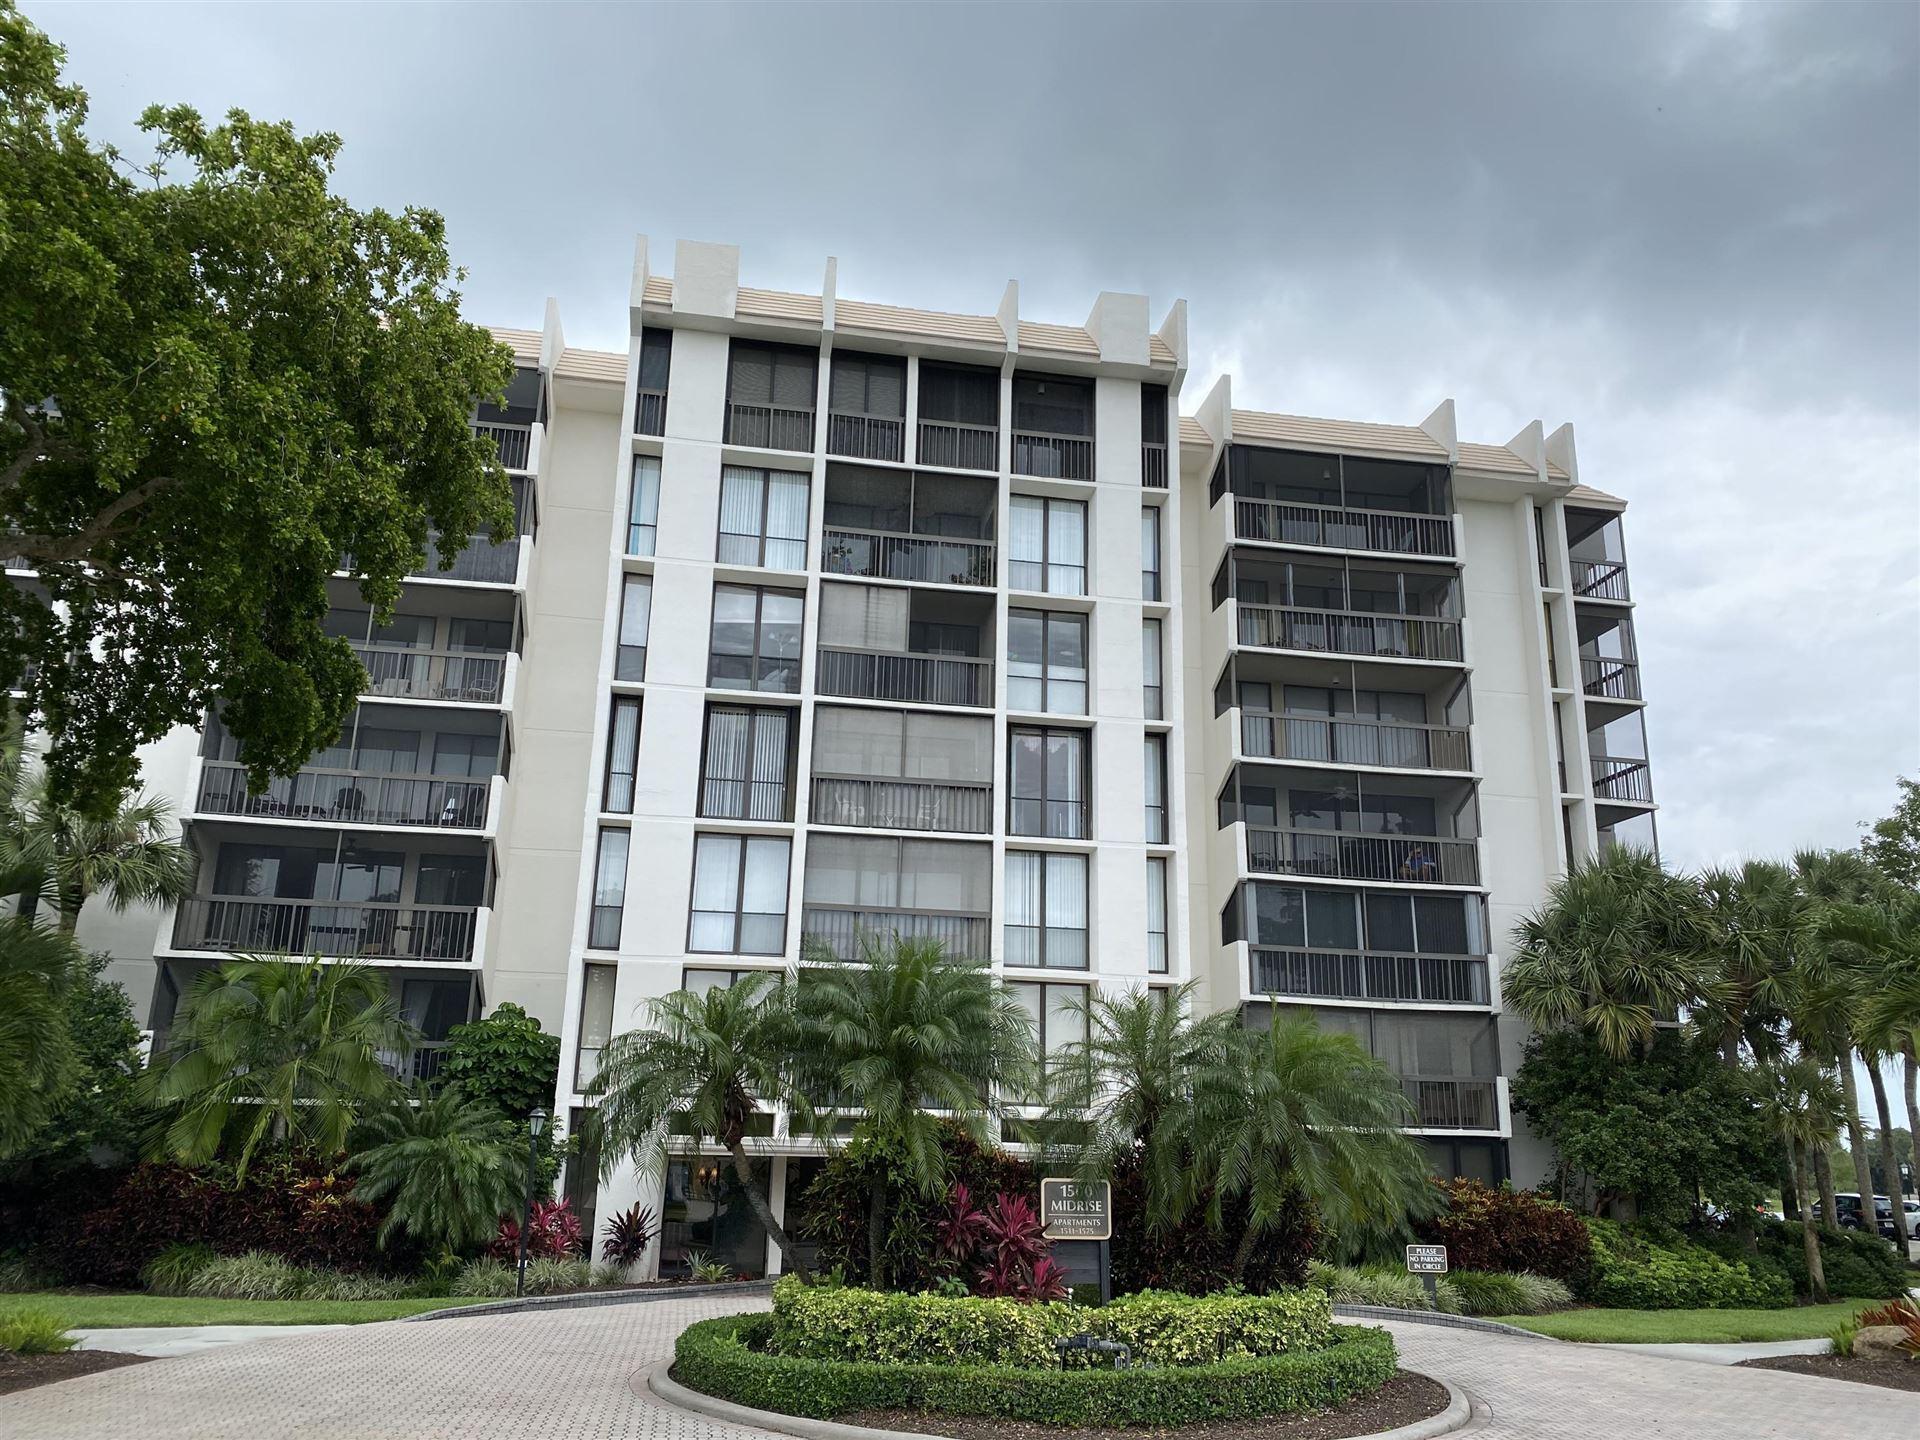 1551 Bridgewood Drive #1551, Boca Raton, FL 33434 - #: RX-10628793